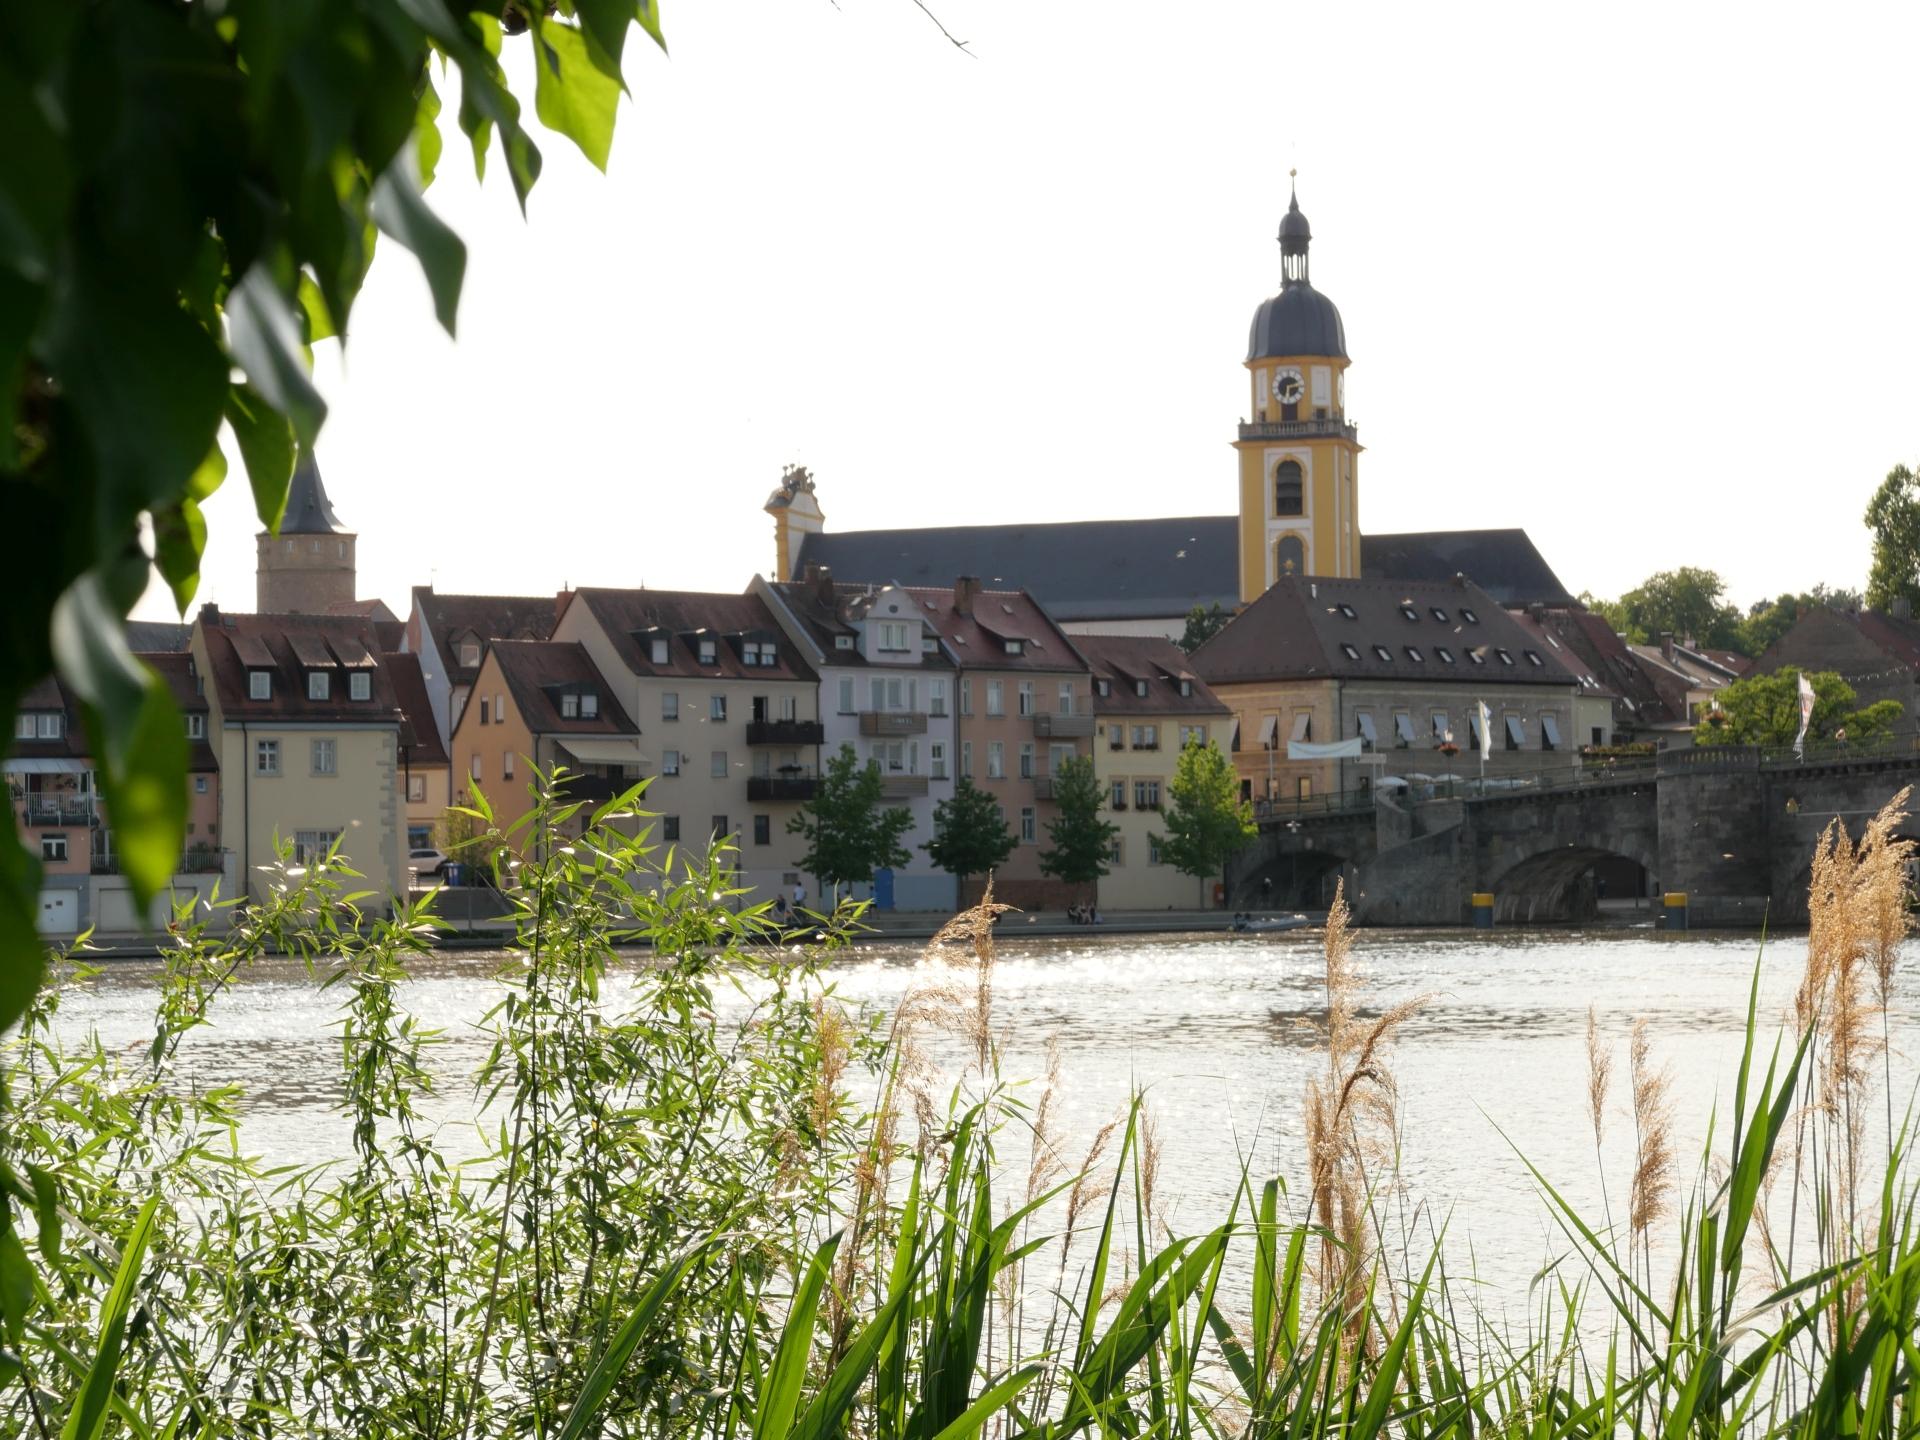 Stadtsilouhette von Kitzingen am Main mit Falterturm